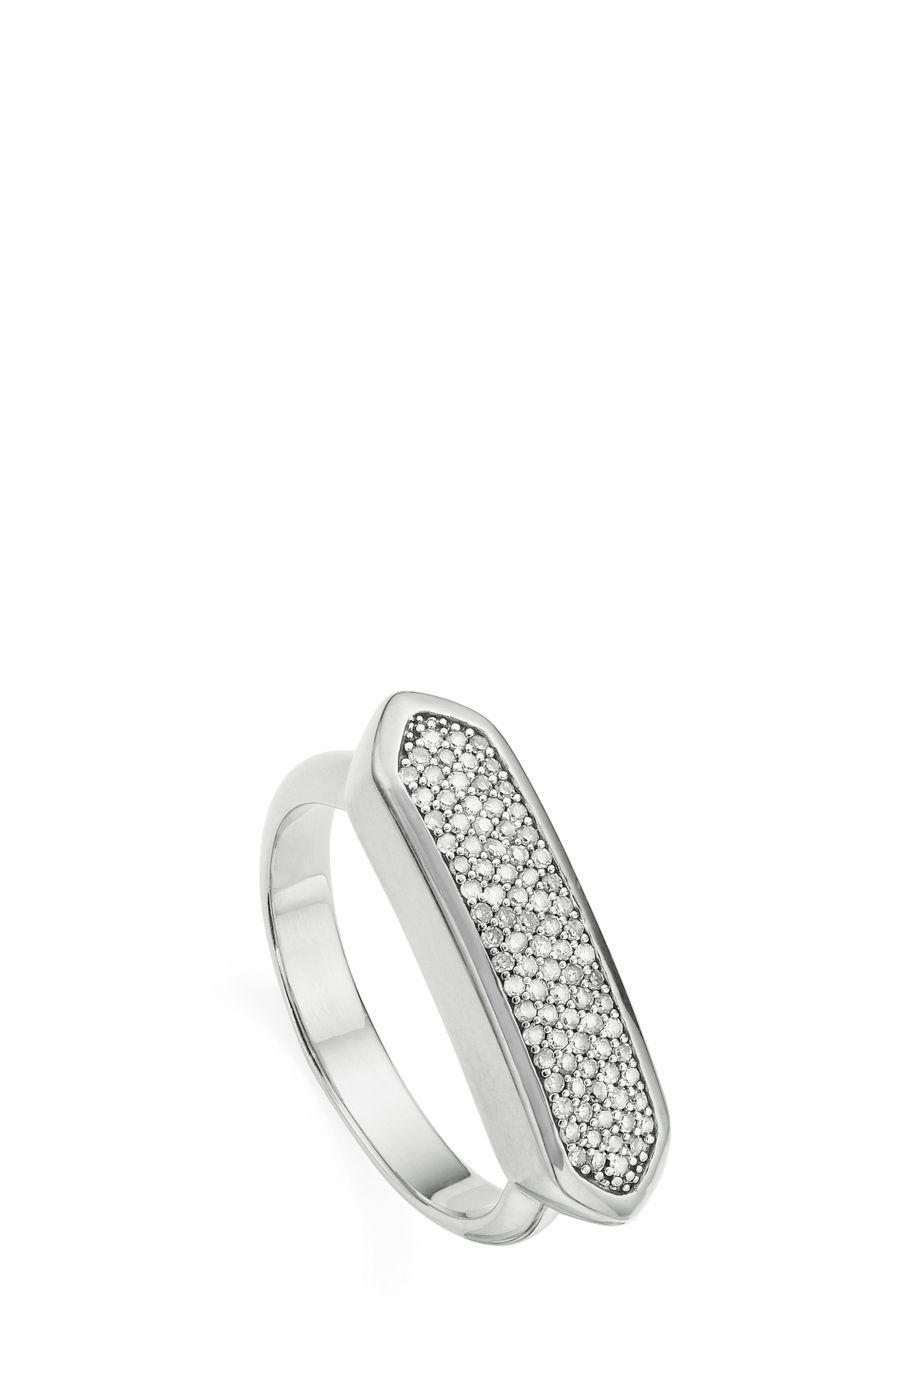 Baja Diamond Ring, Sterling Silver Monica Vinader